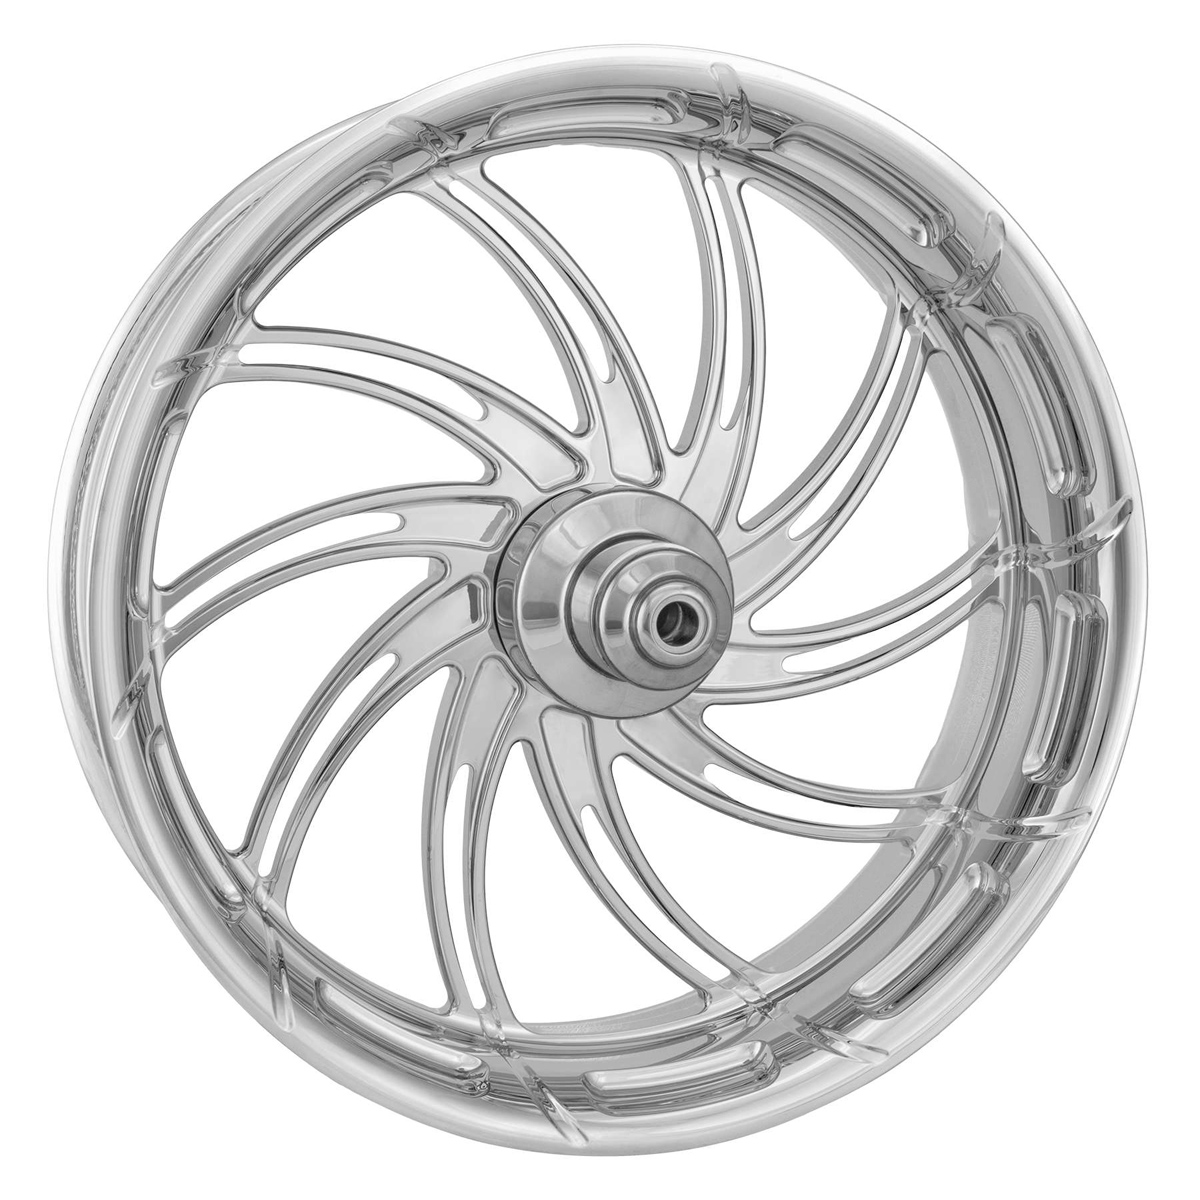 Performance Machine Supra Chrome Rear Wheel 18x4.25 ABS